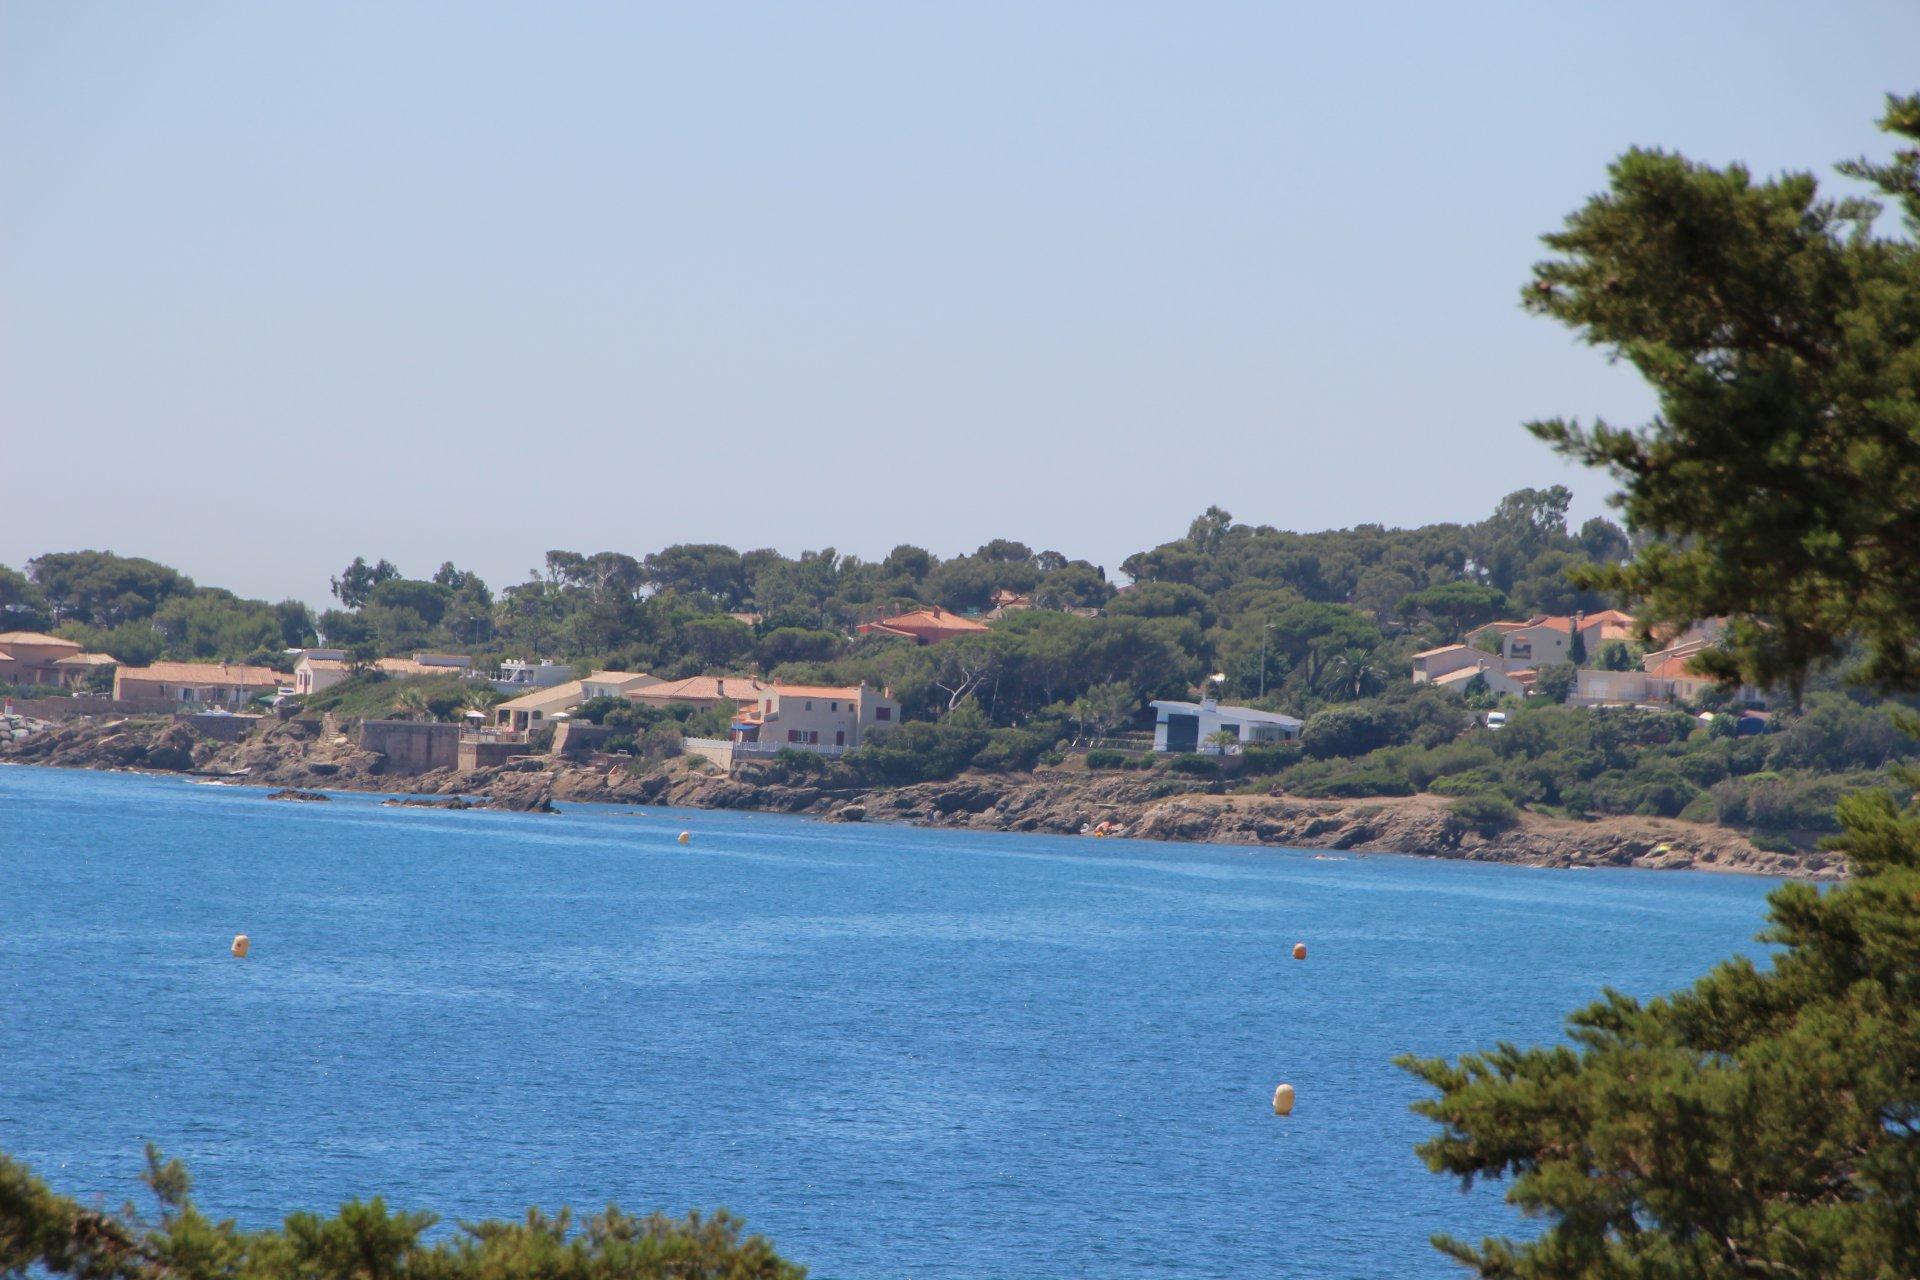 SEA VIEW VILLA AT SAINT AYGULF CLOSE TO THE BEACH